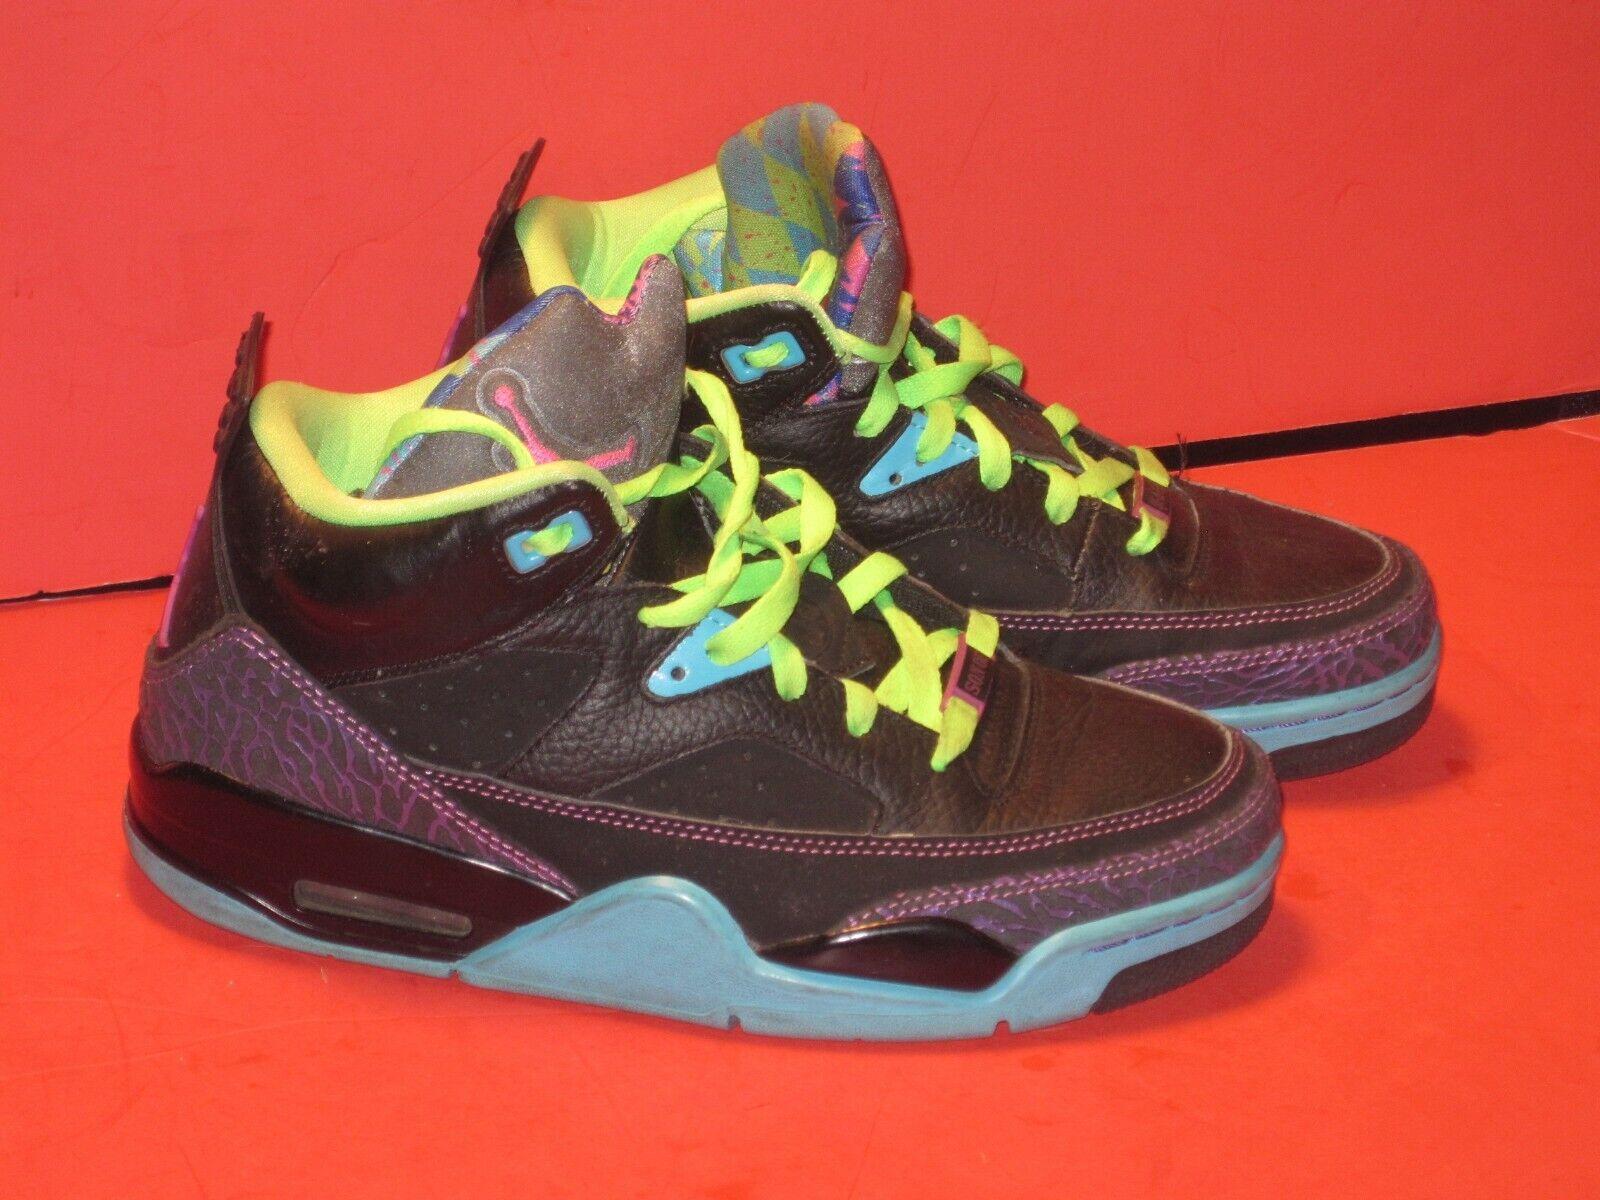 online retailer 4bbc5 3b8cf Nike Air Air Air Jordon Son of Low Belair size 7 1 2 (580603-